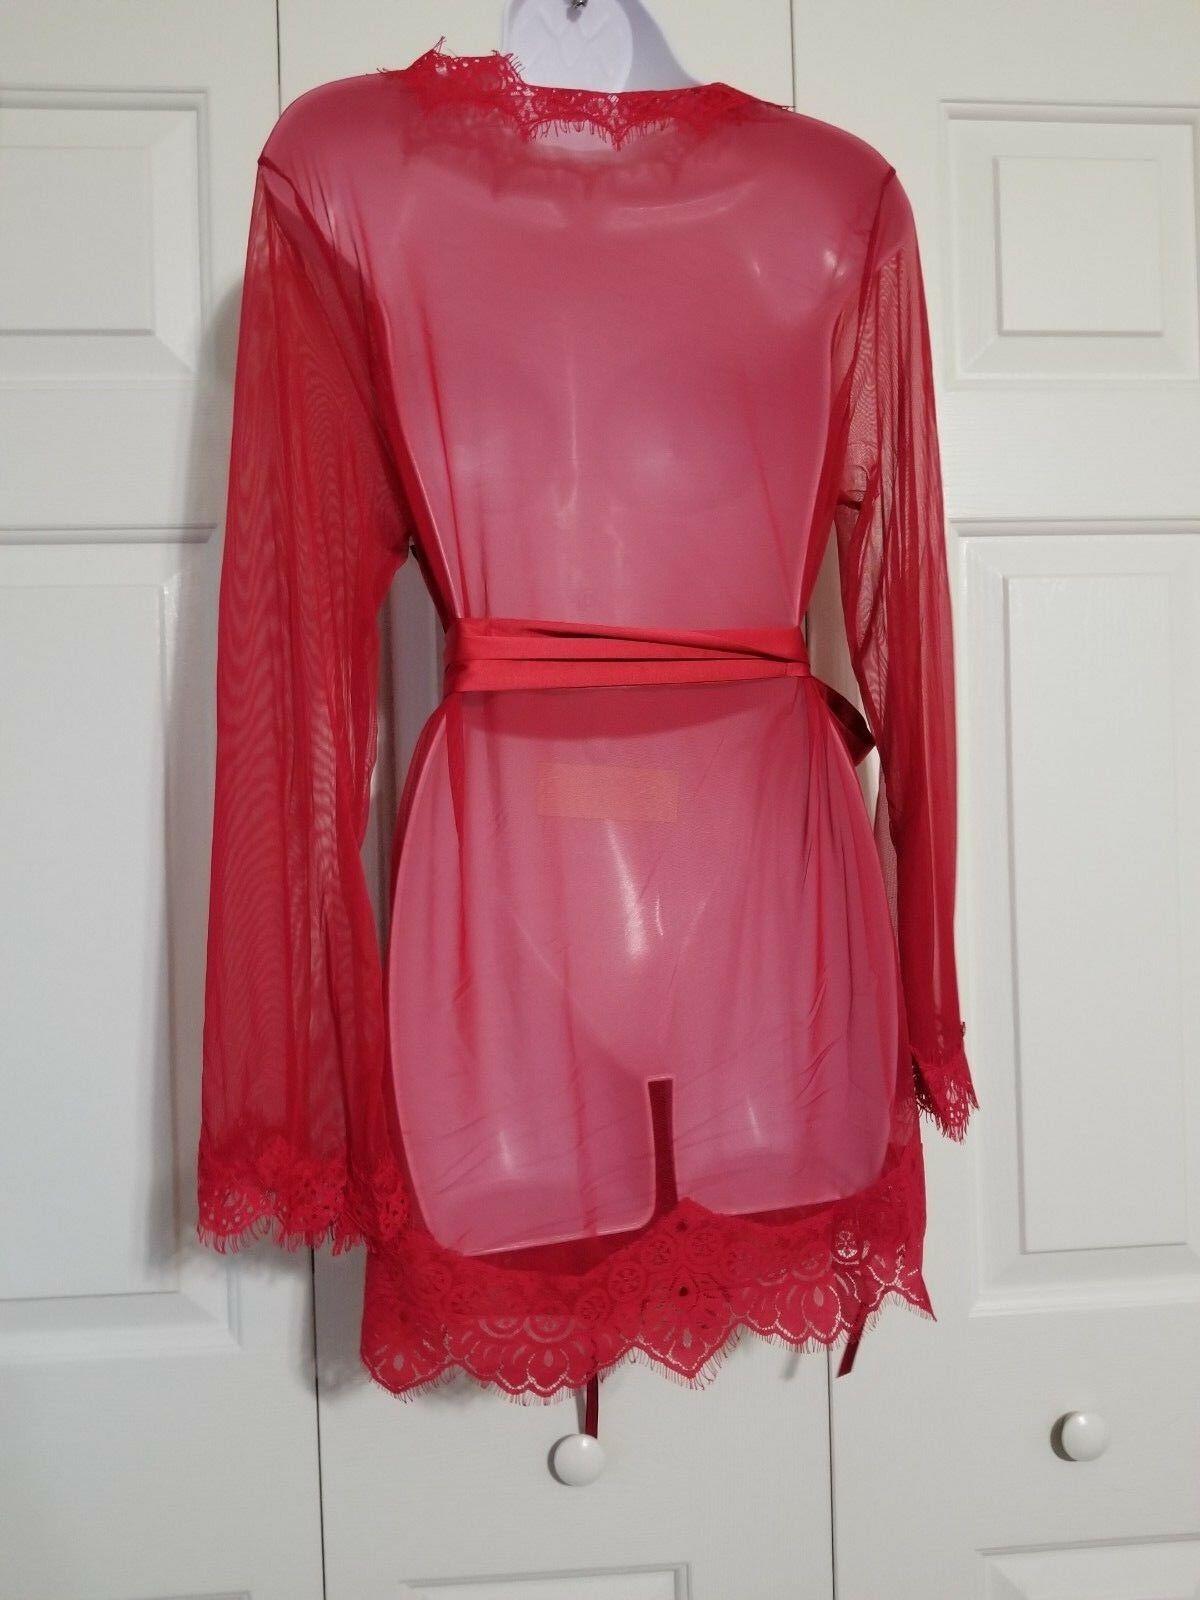 Fashion Nova New Lover Robe Red Size 1X/2X NWT